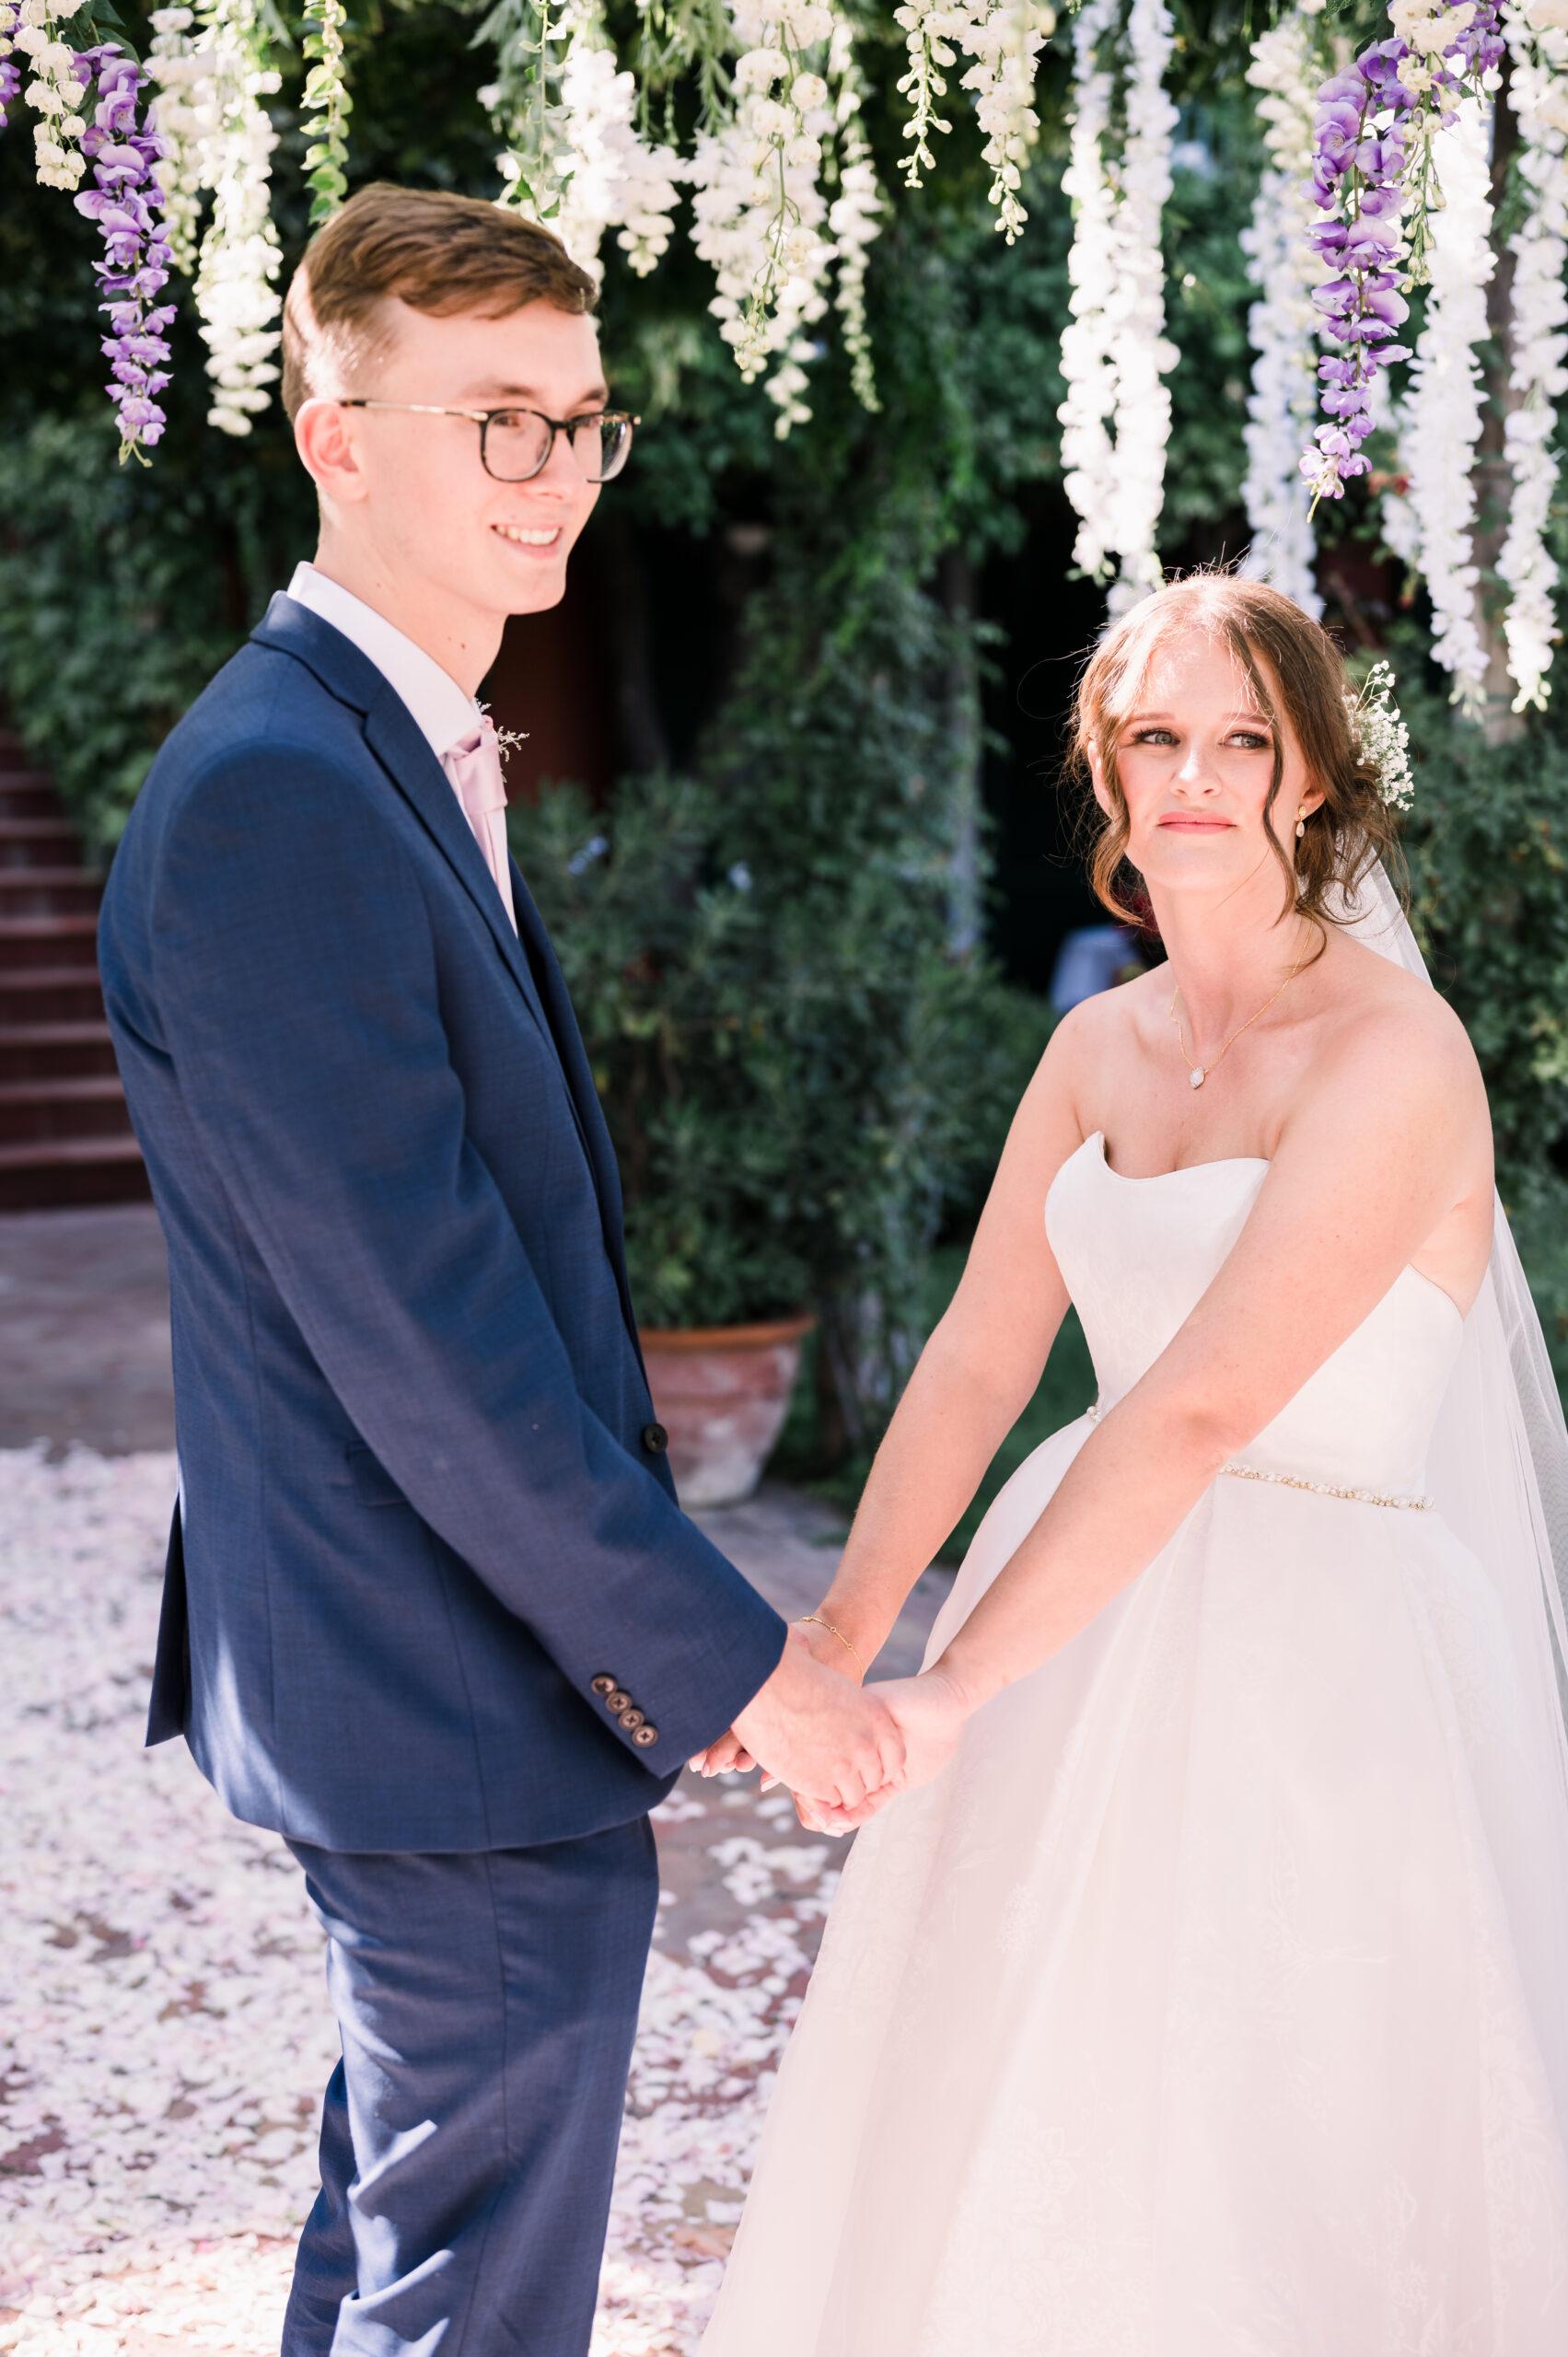 Ben and Holly wedding in Maiori, Amalfi Coast, Italy (8)